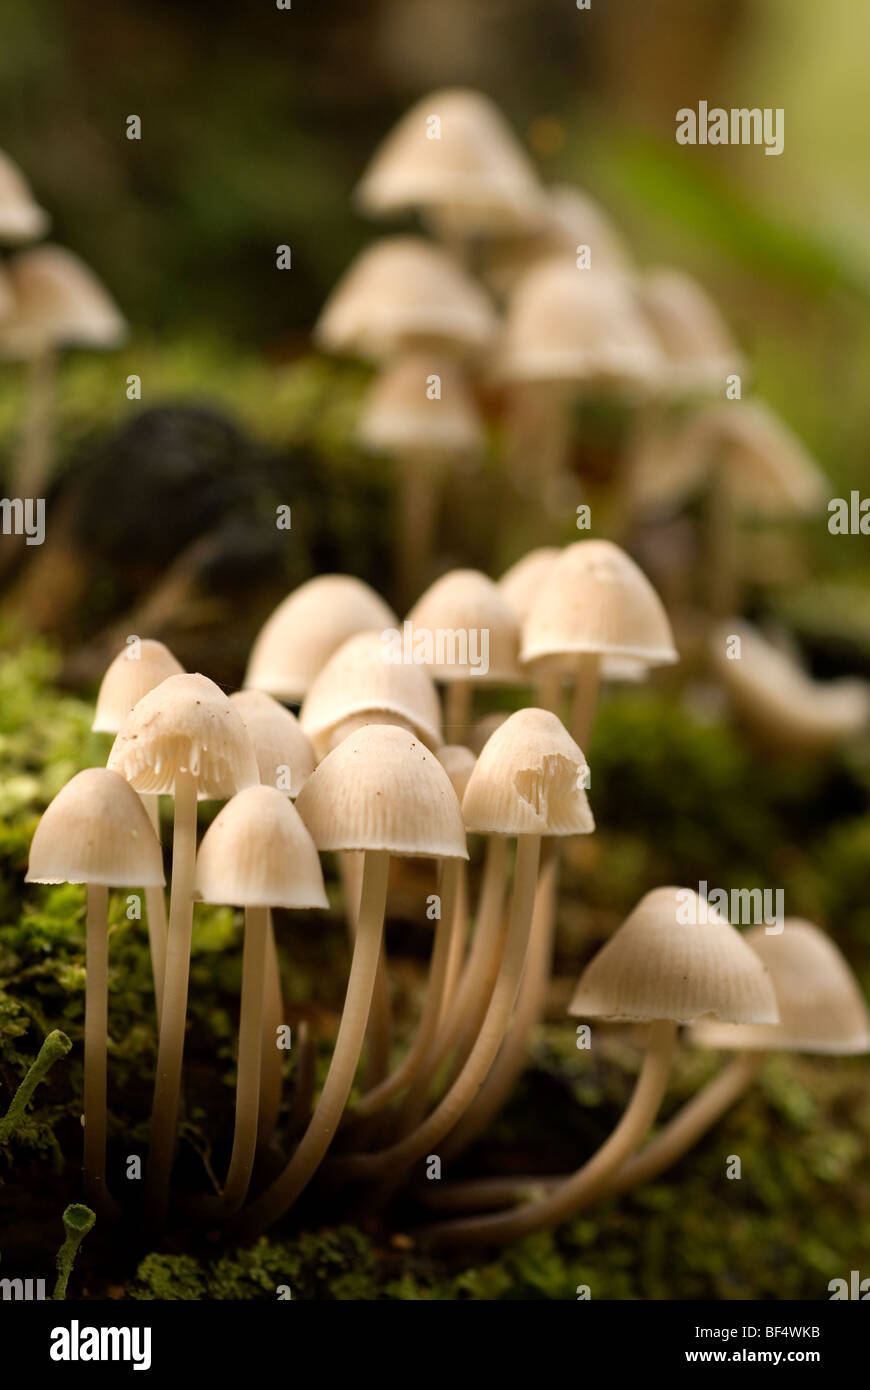 Fairies Bonnets, Coprinus disseminatus - Stock Image